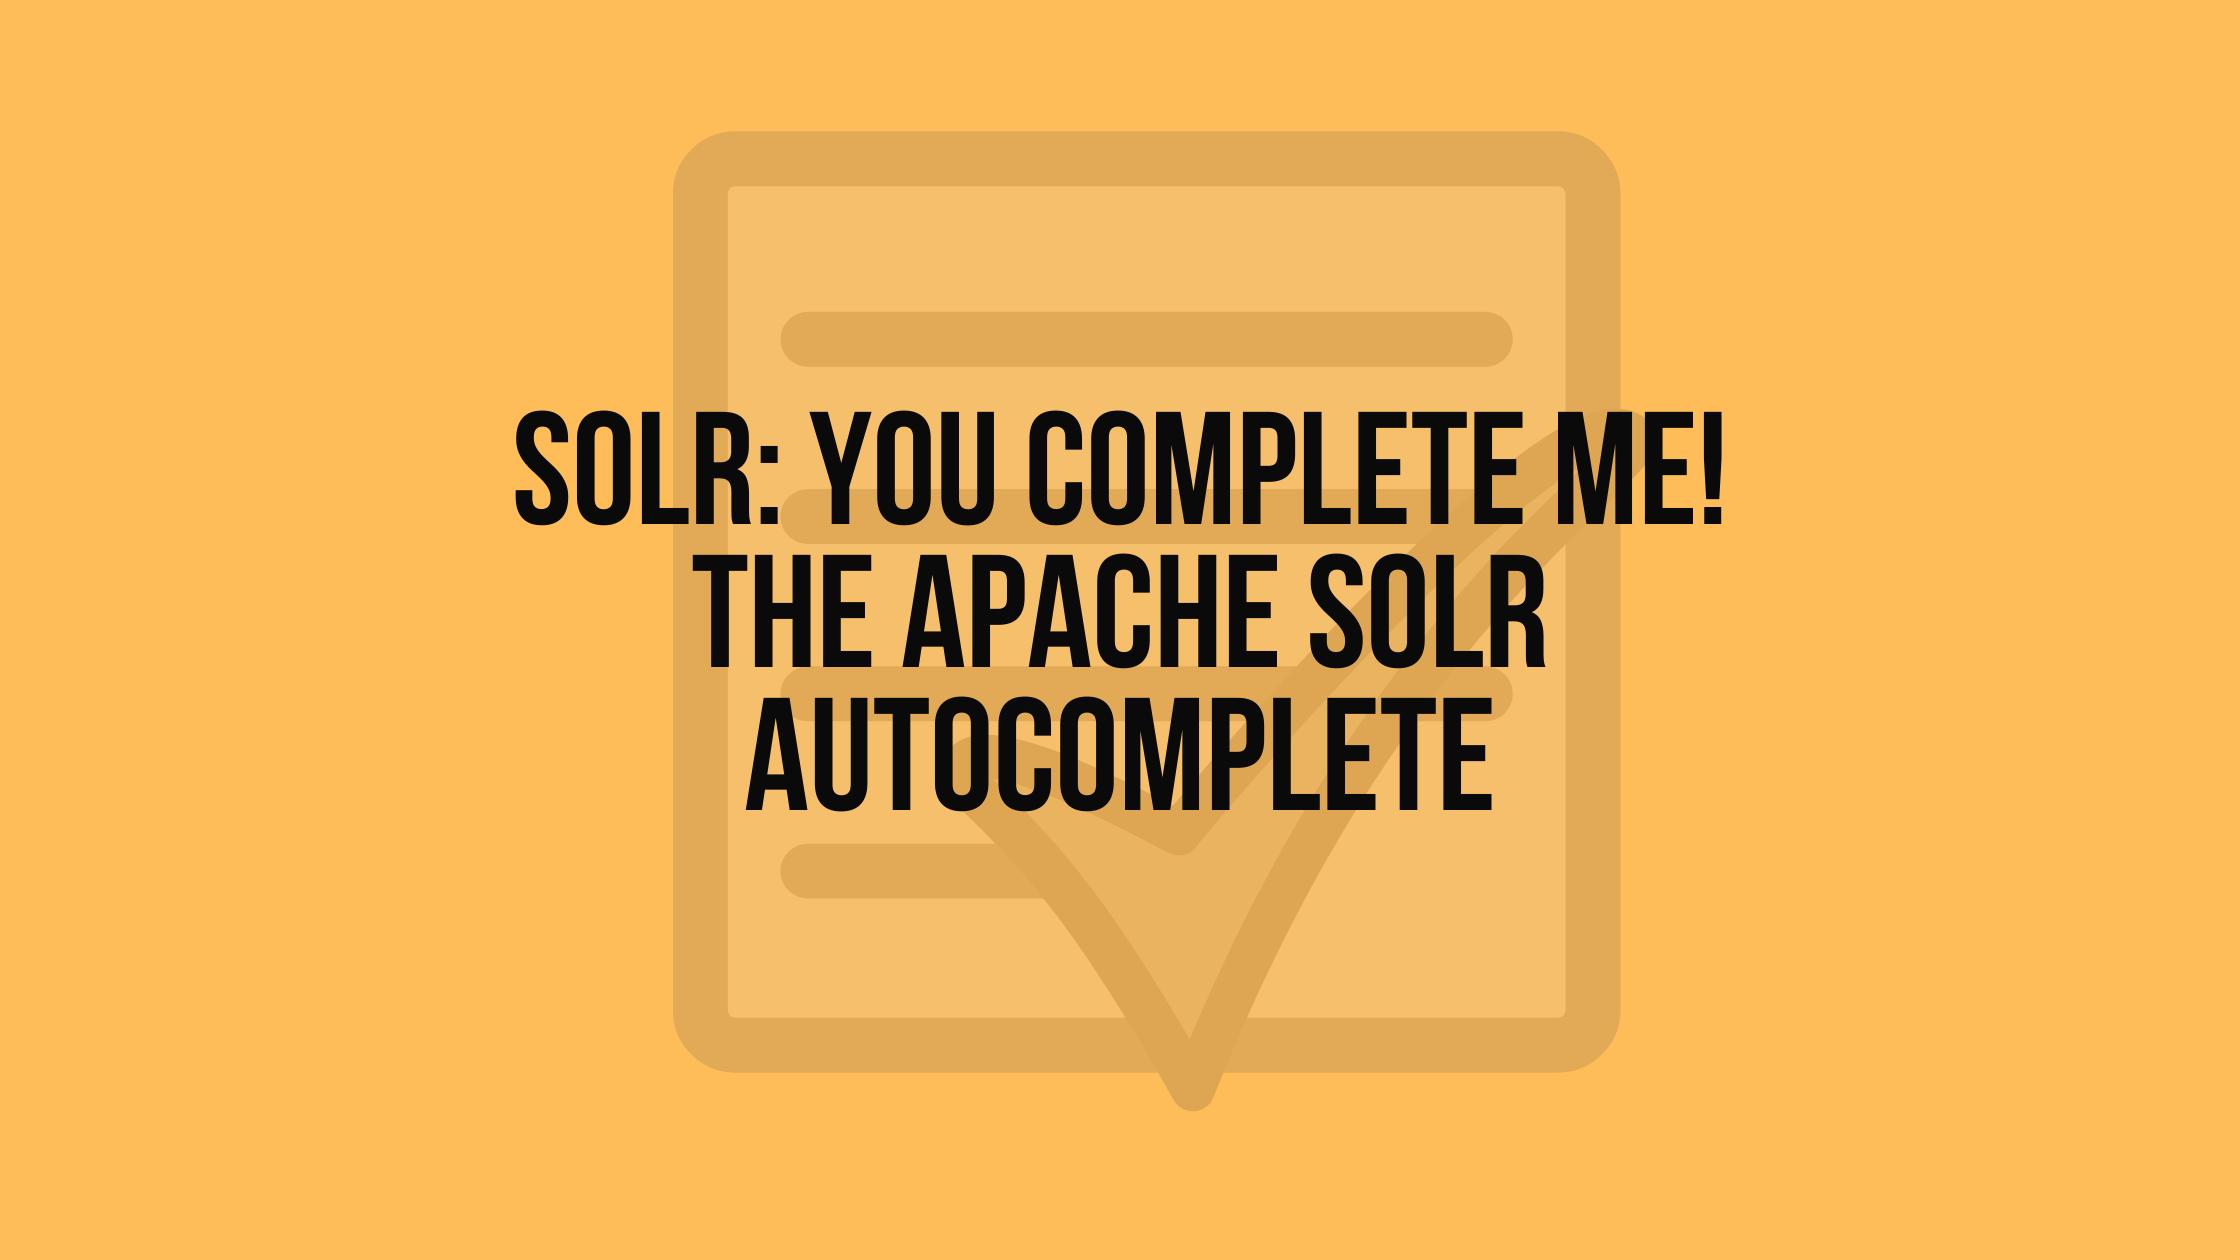 solr autocomplete